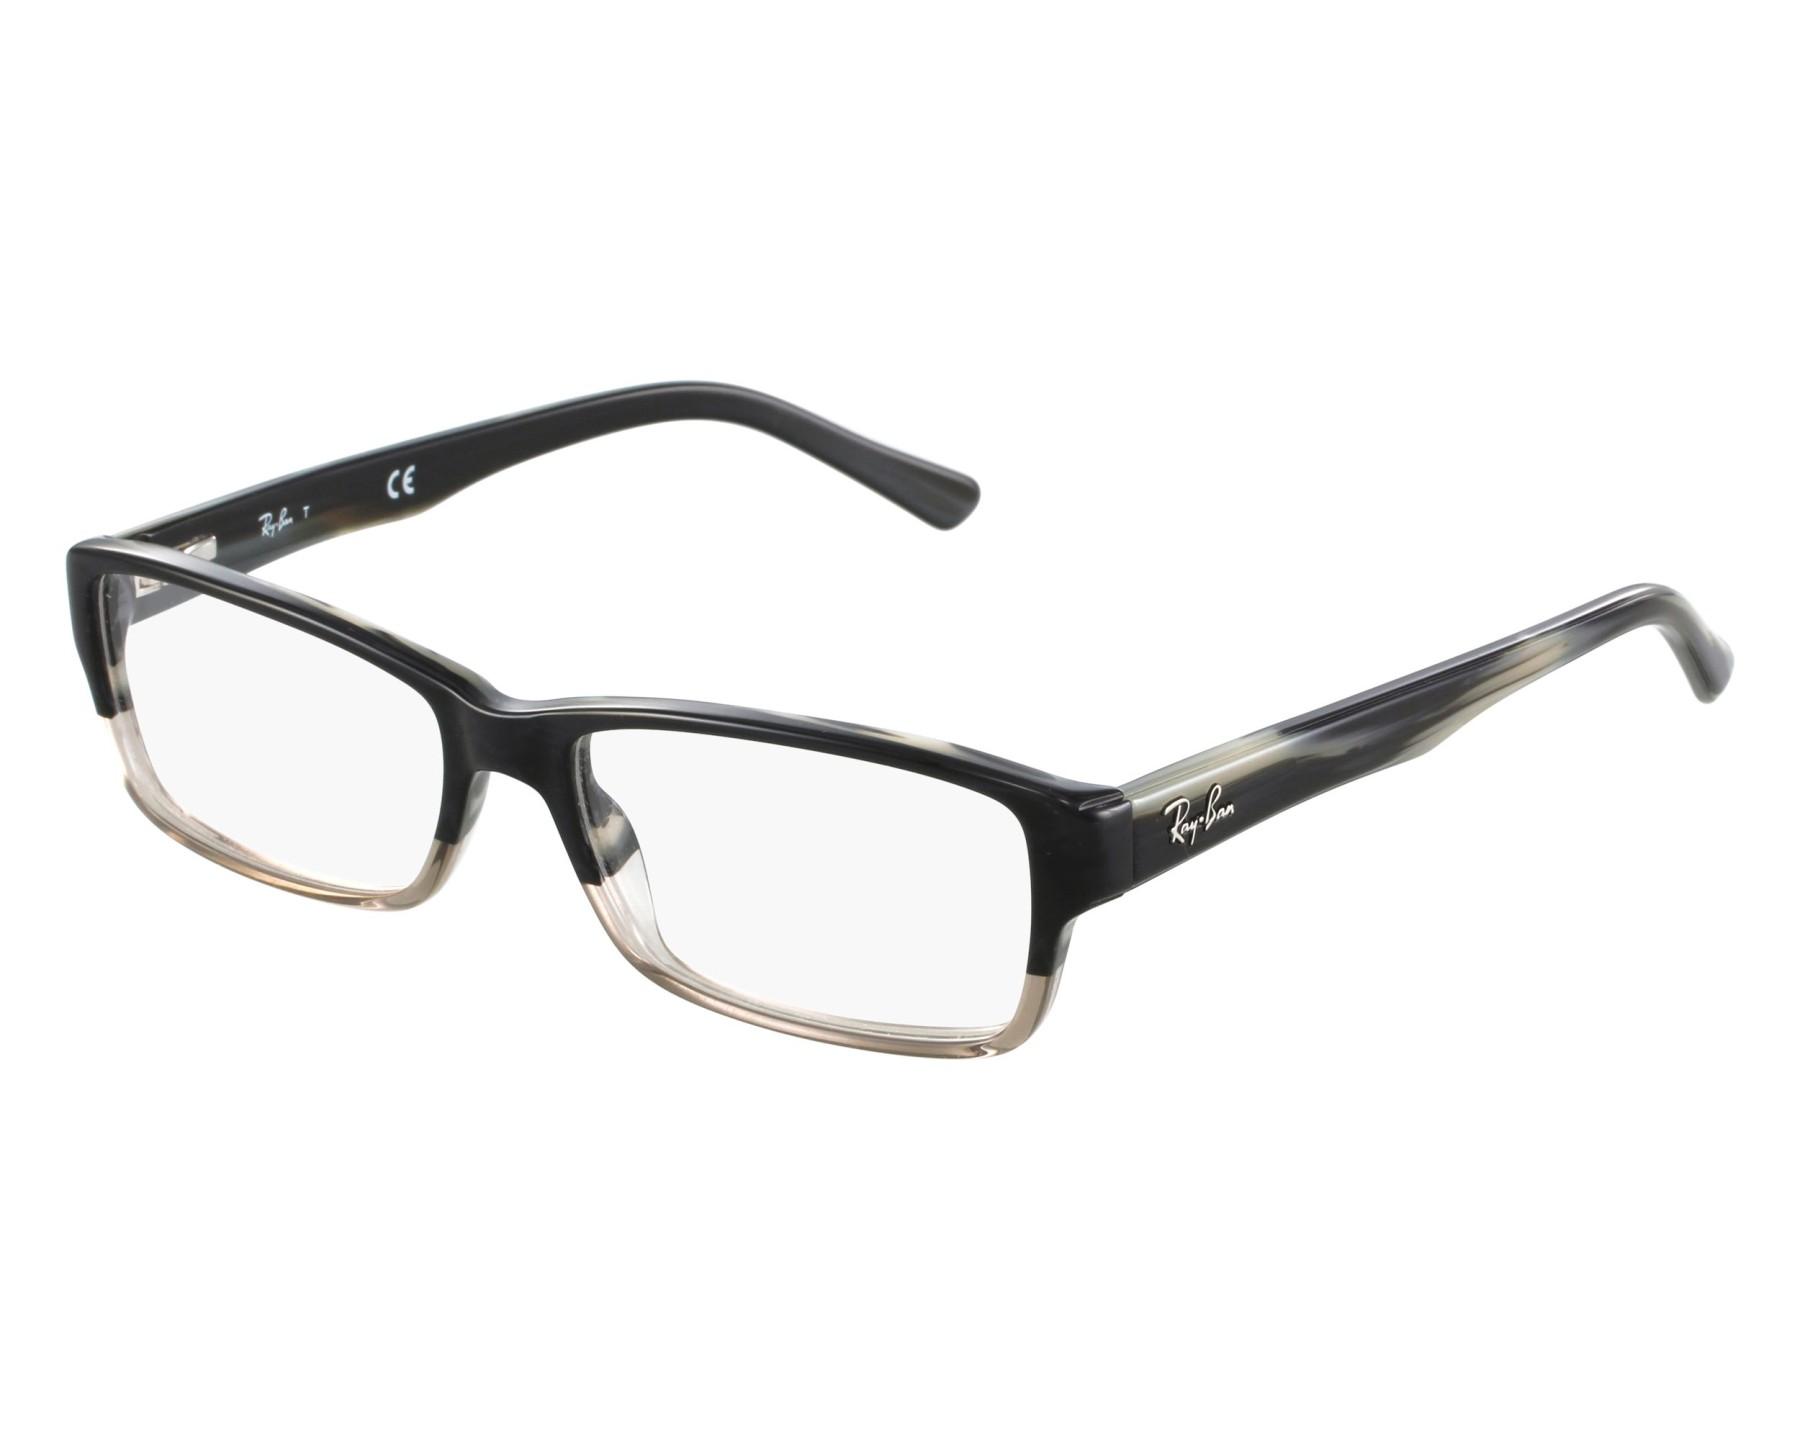 orig ray ban brille brillengestell rx5169 5540 neu ebay. Black Bedroom Furniture Sets. Home Design Ideas